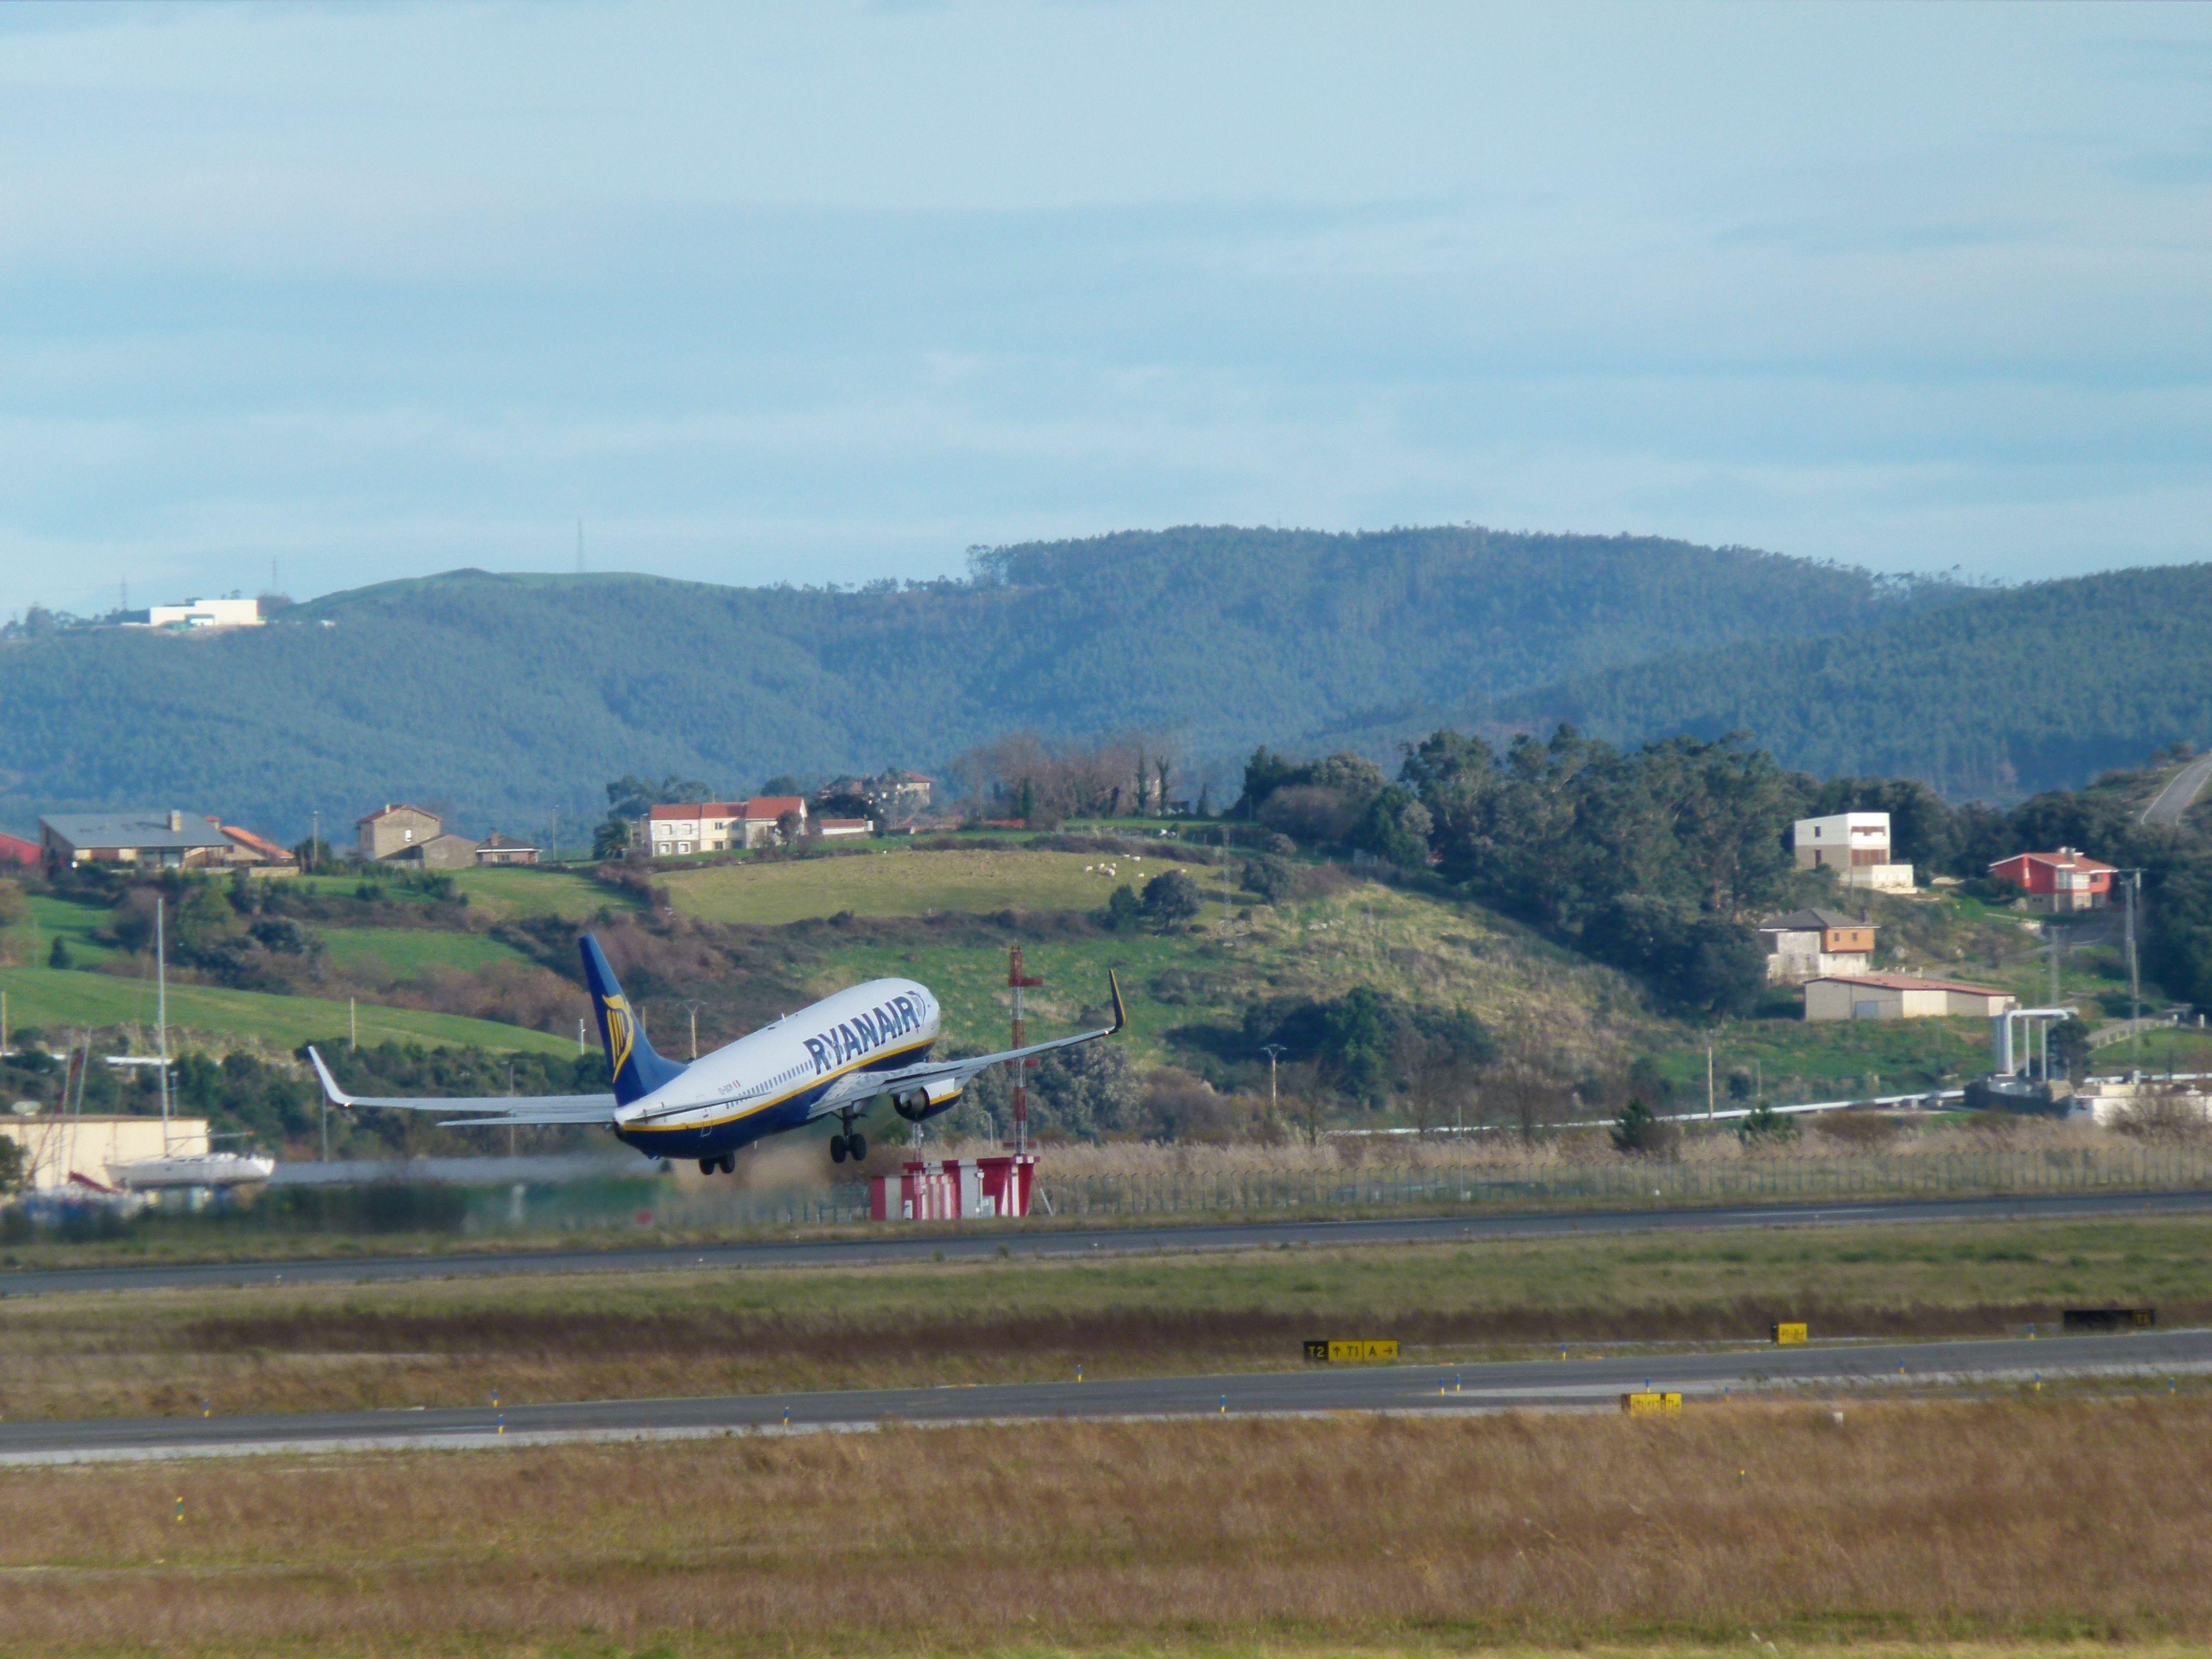 Ryanair airplane departing